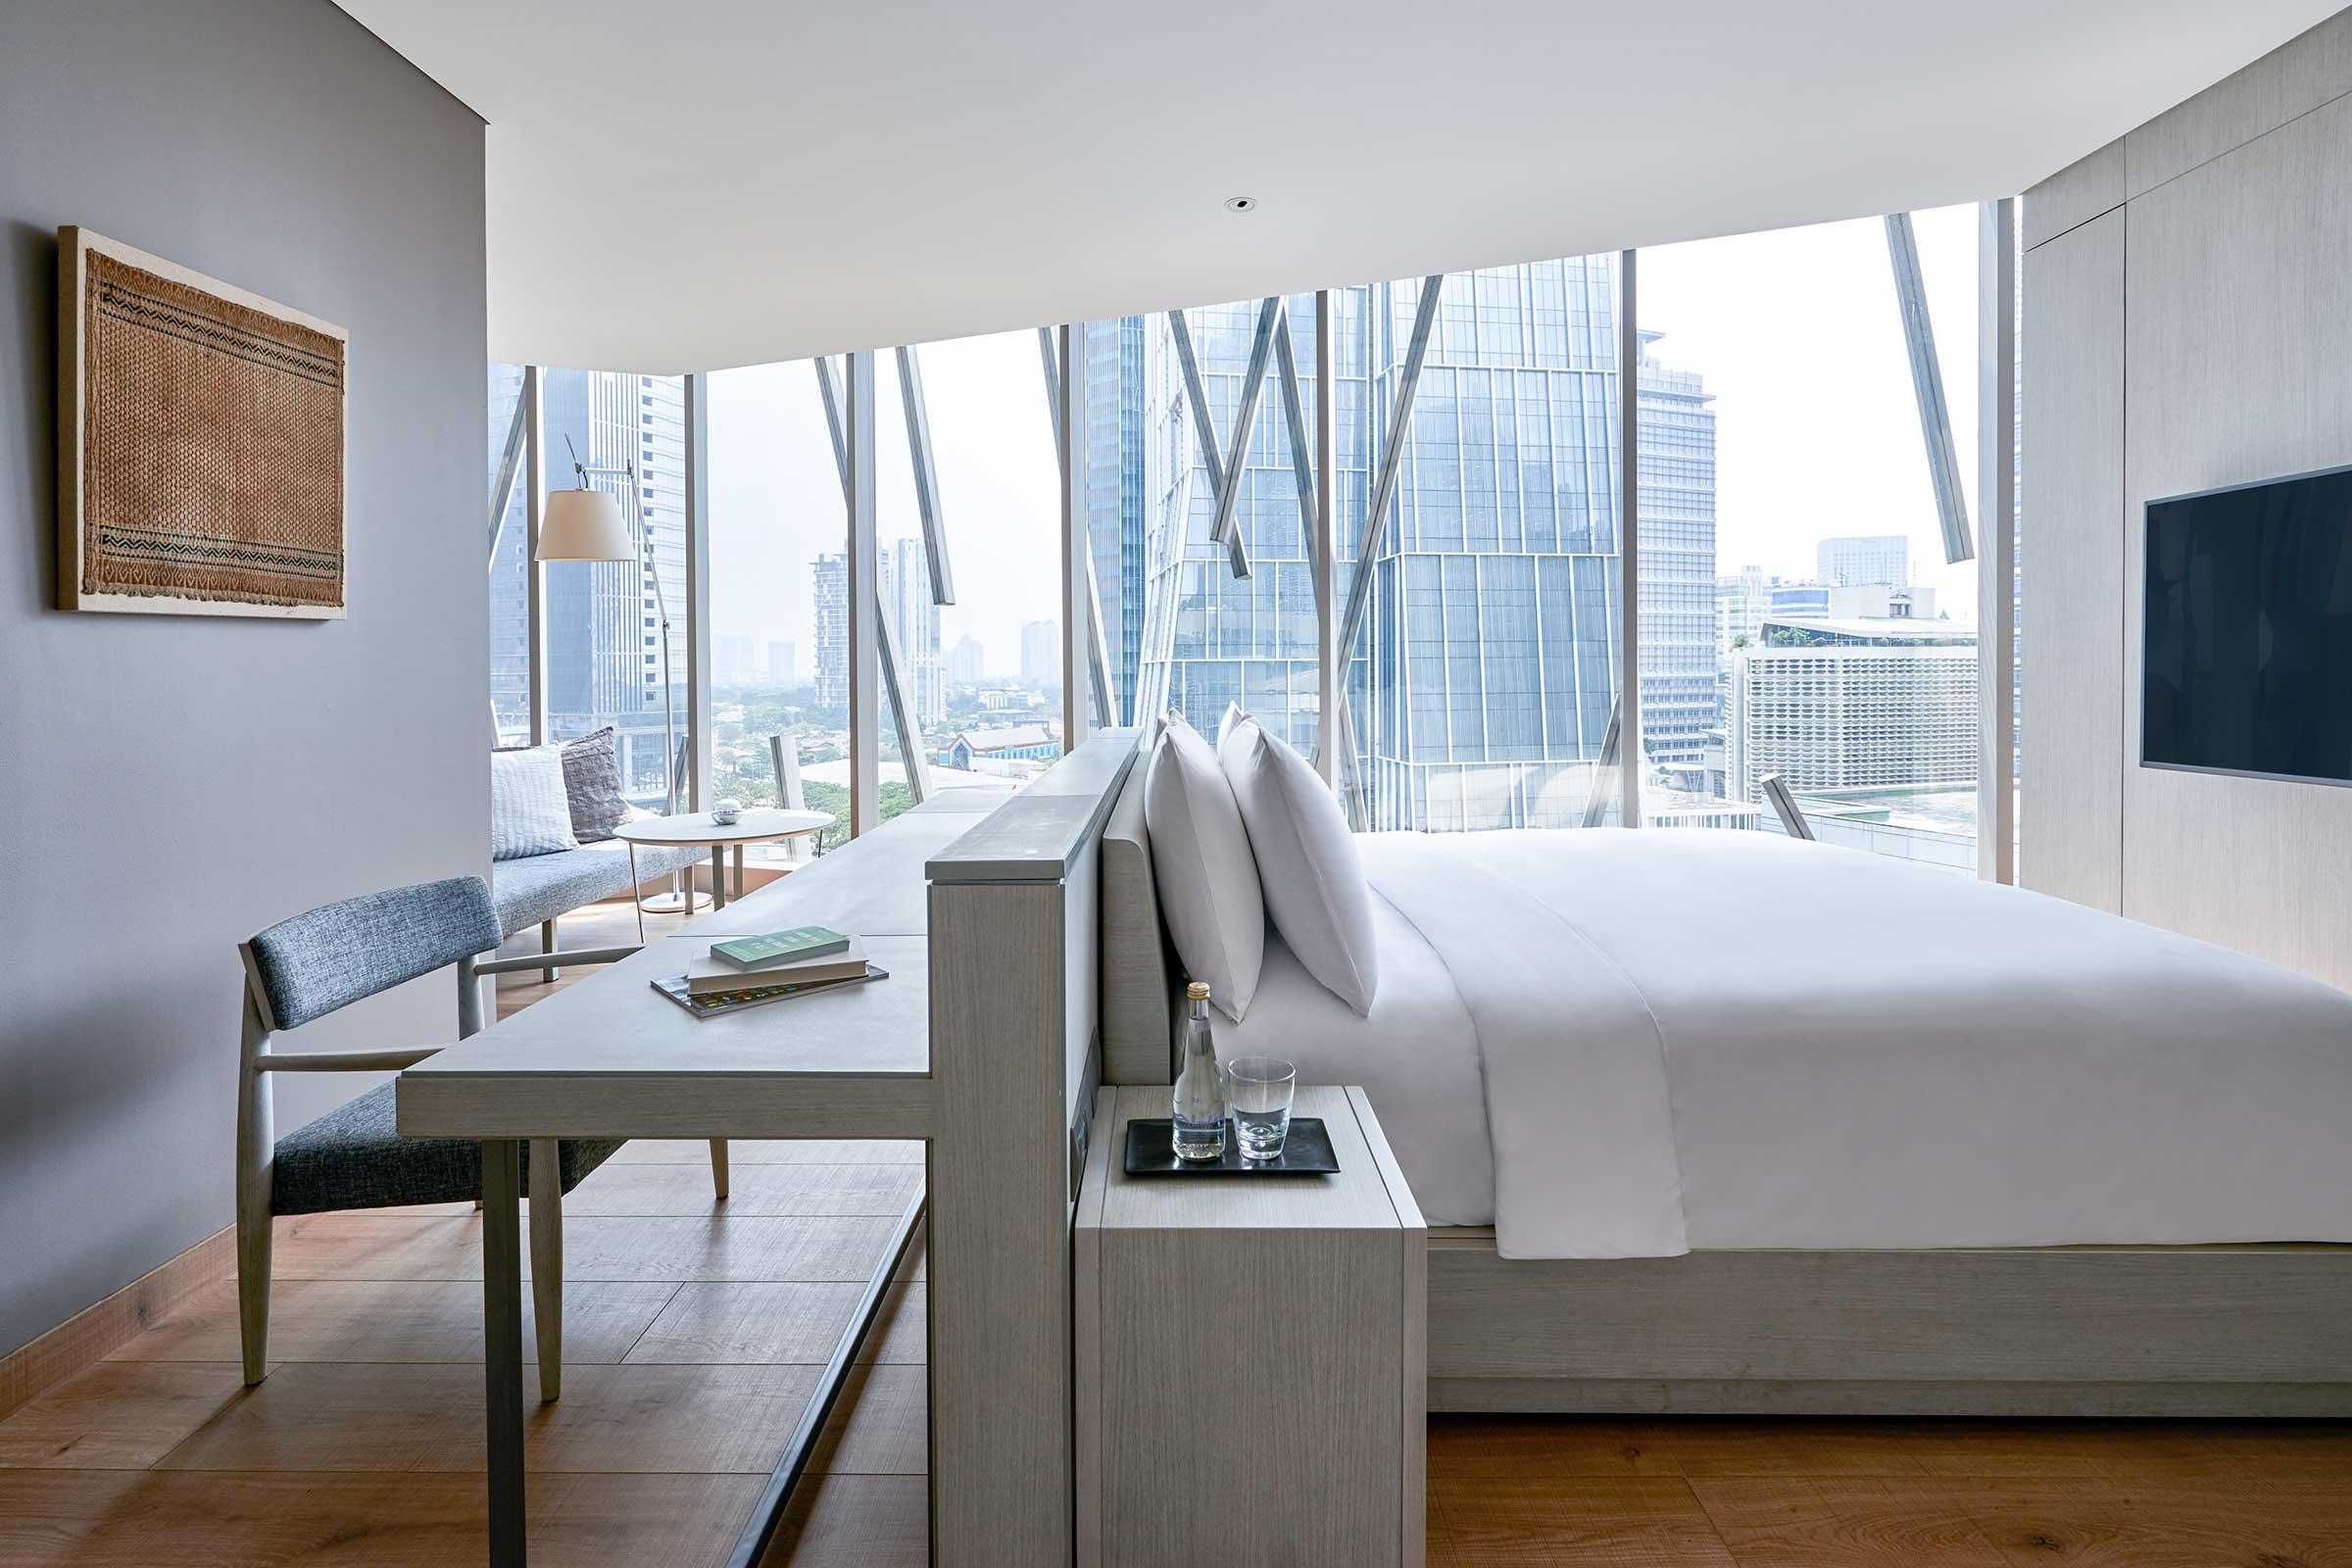 AJS---Accommodation---XL-King---Bedroom.jpg